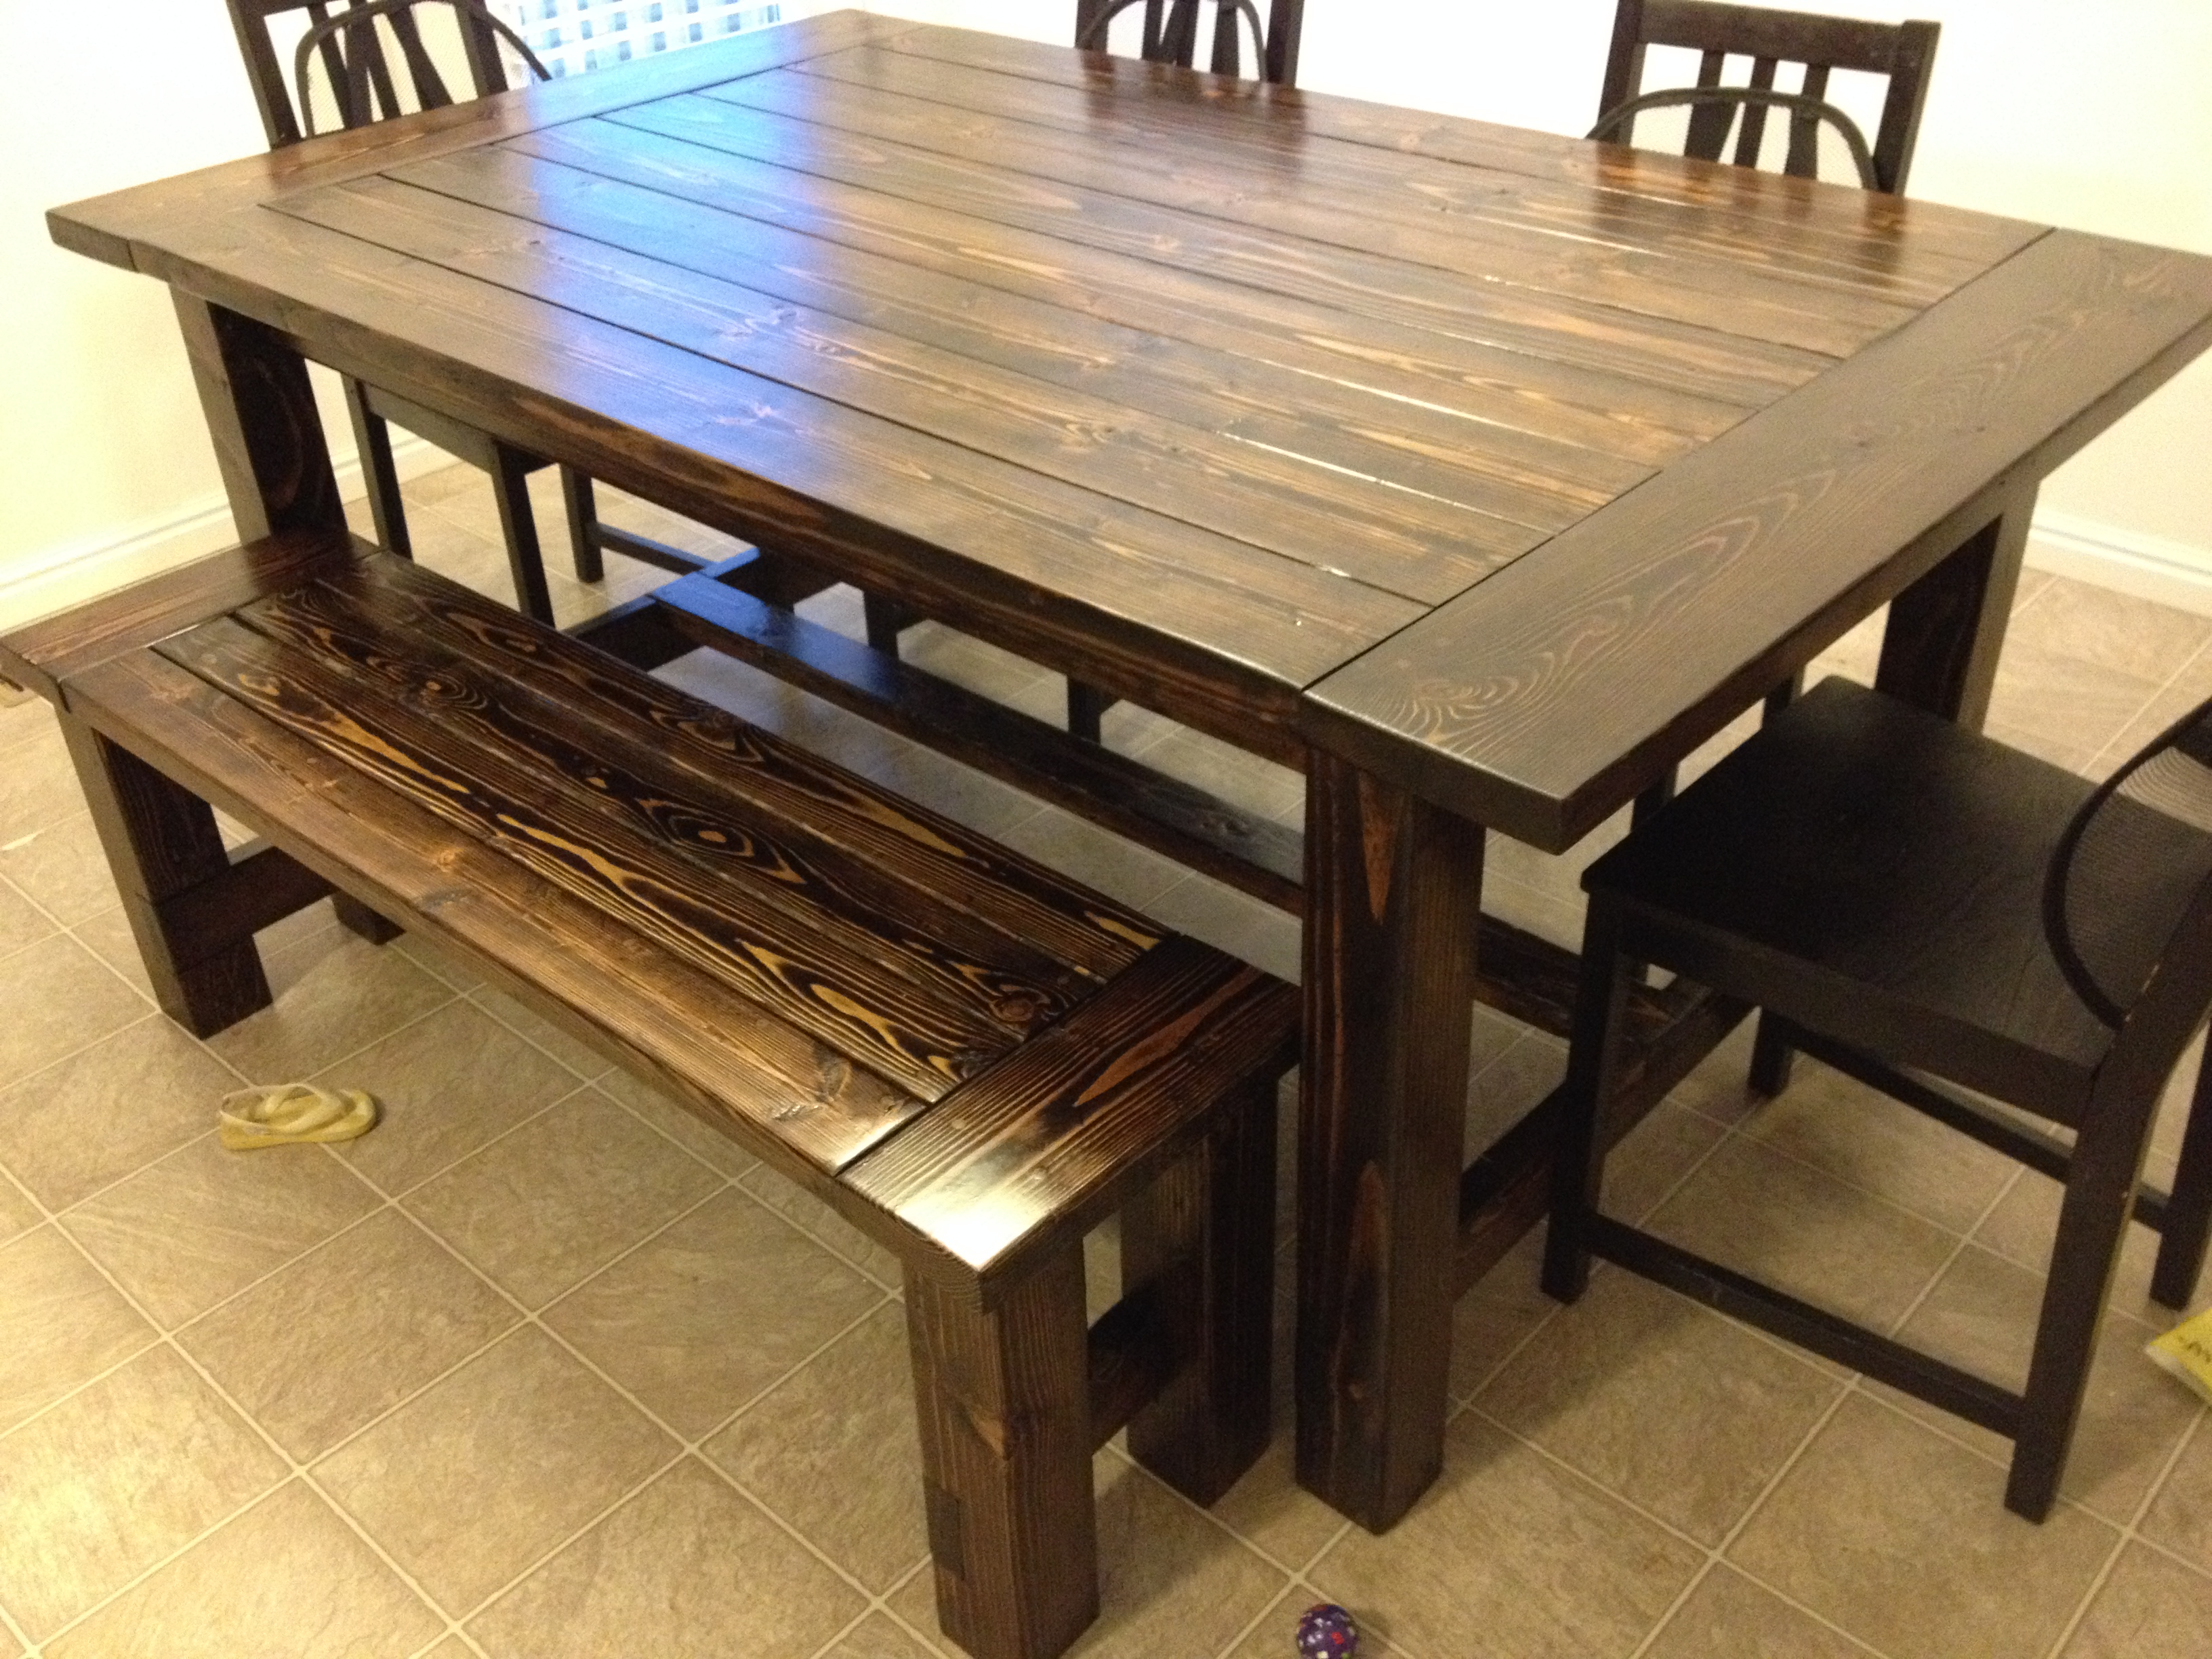 Ana White Farmhouse Table And Bench